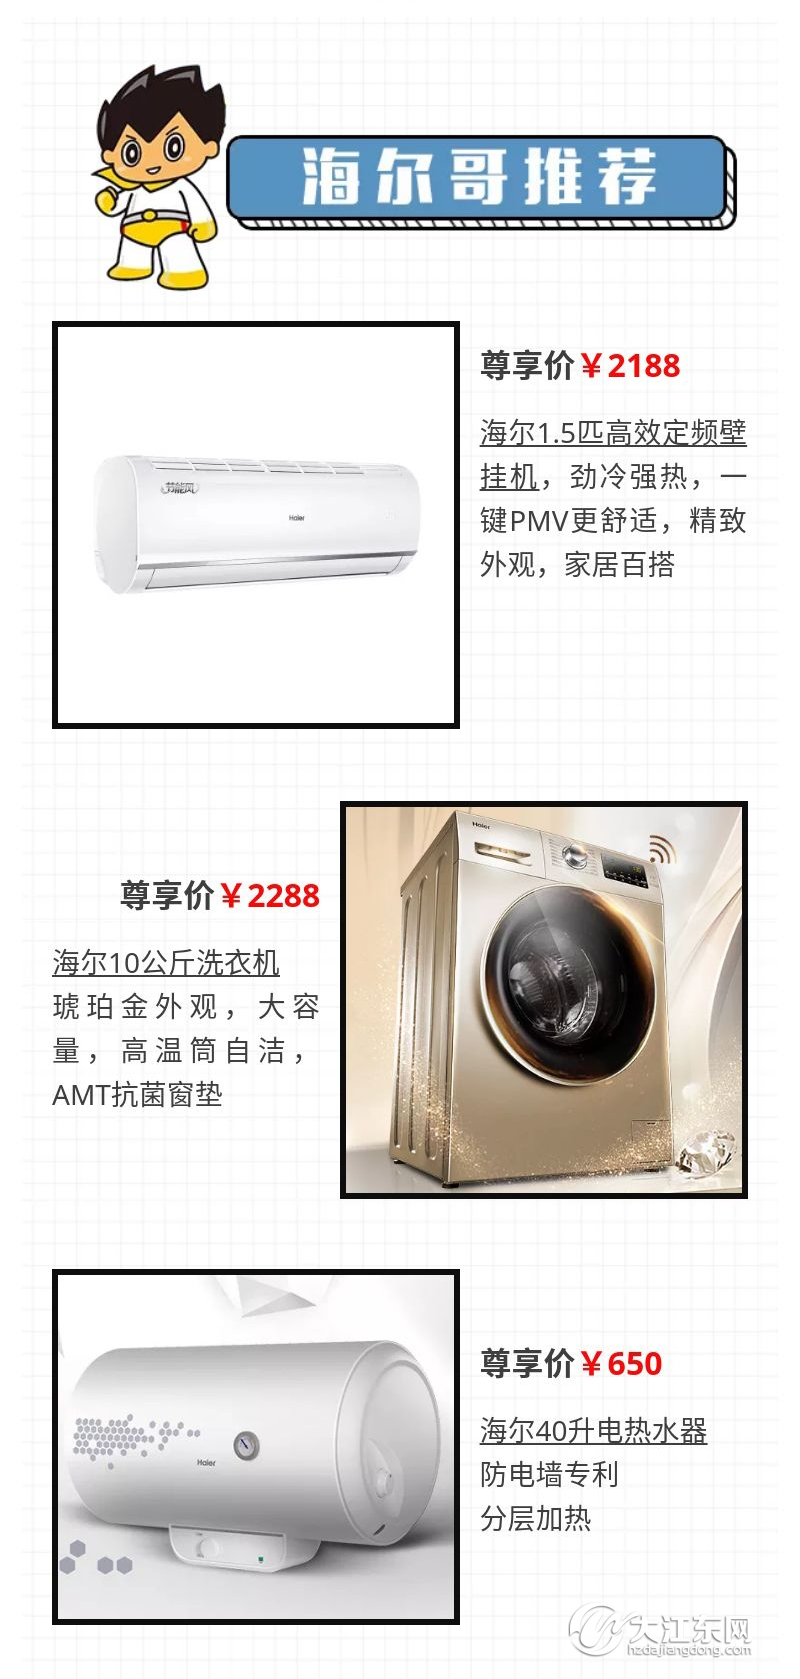 xiumi_1537326679458_64421565_12.png